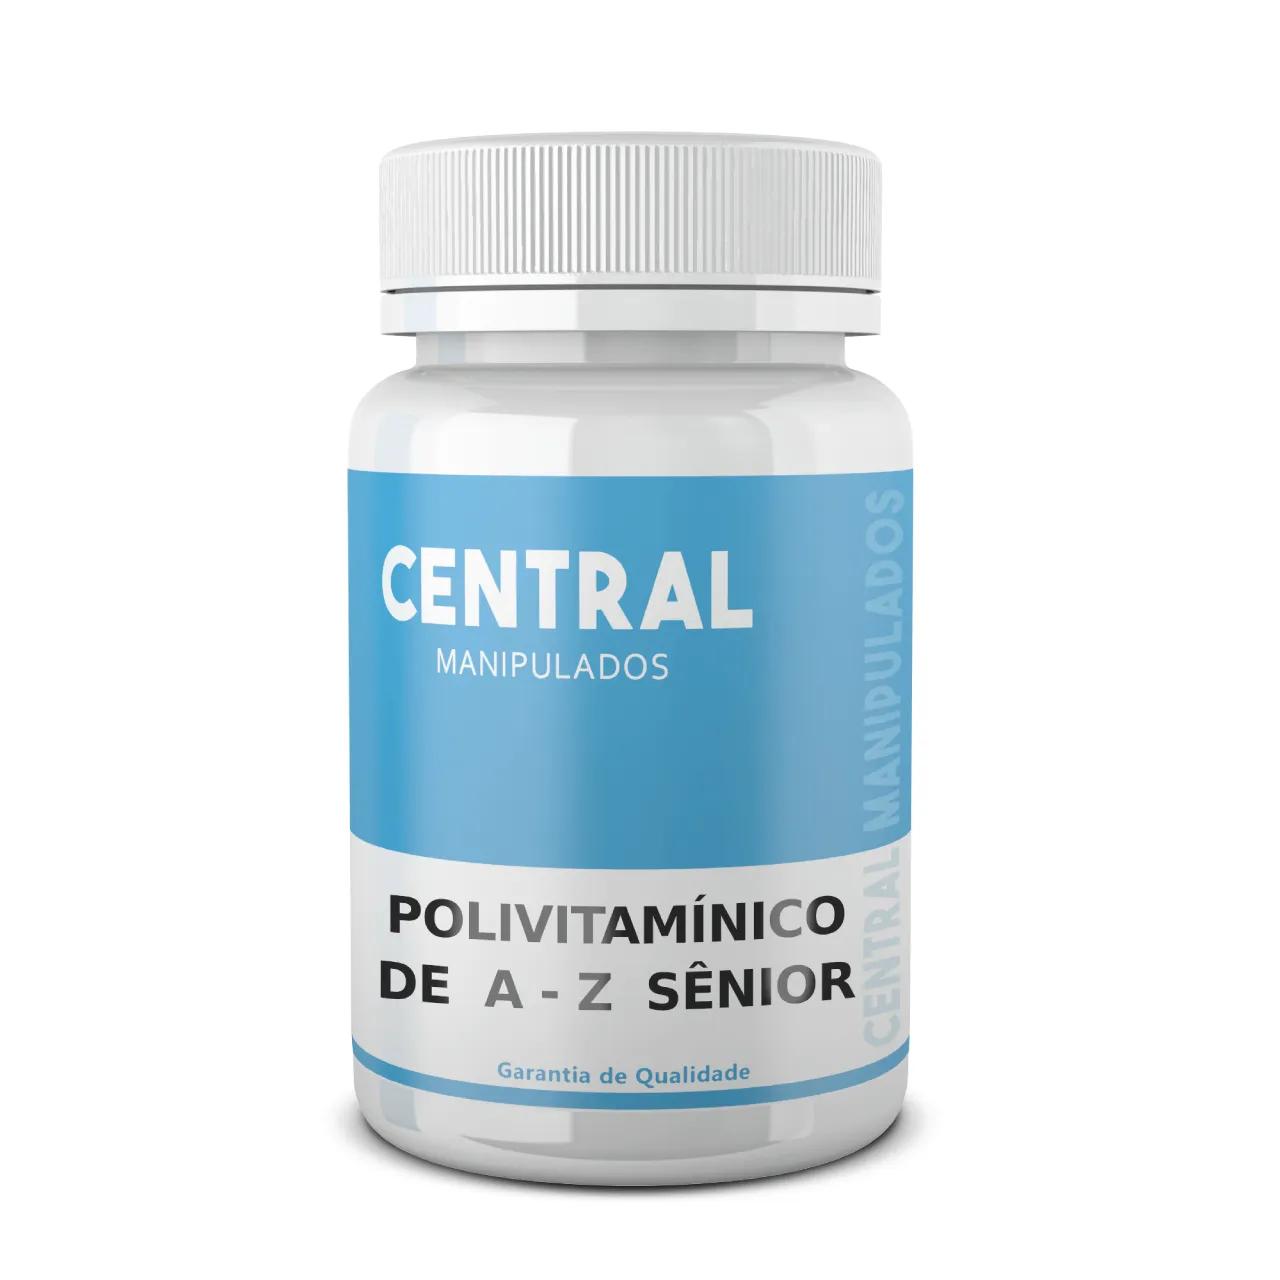 Central Polivitamínico Sênior de A-Z - 30 cápsulas - complexo vitamínico Central Manipulados